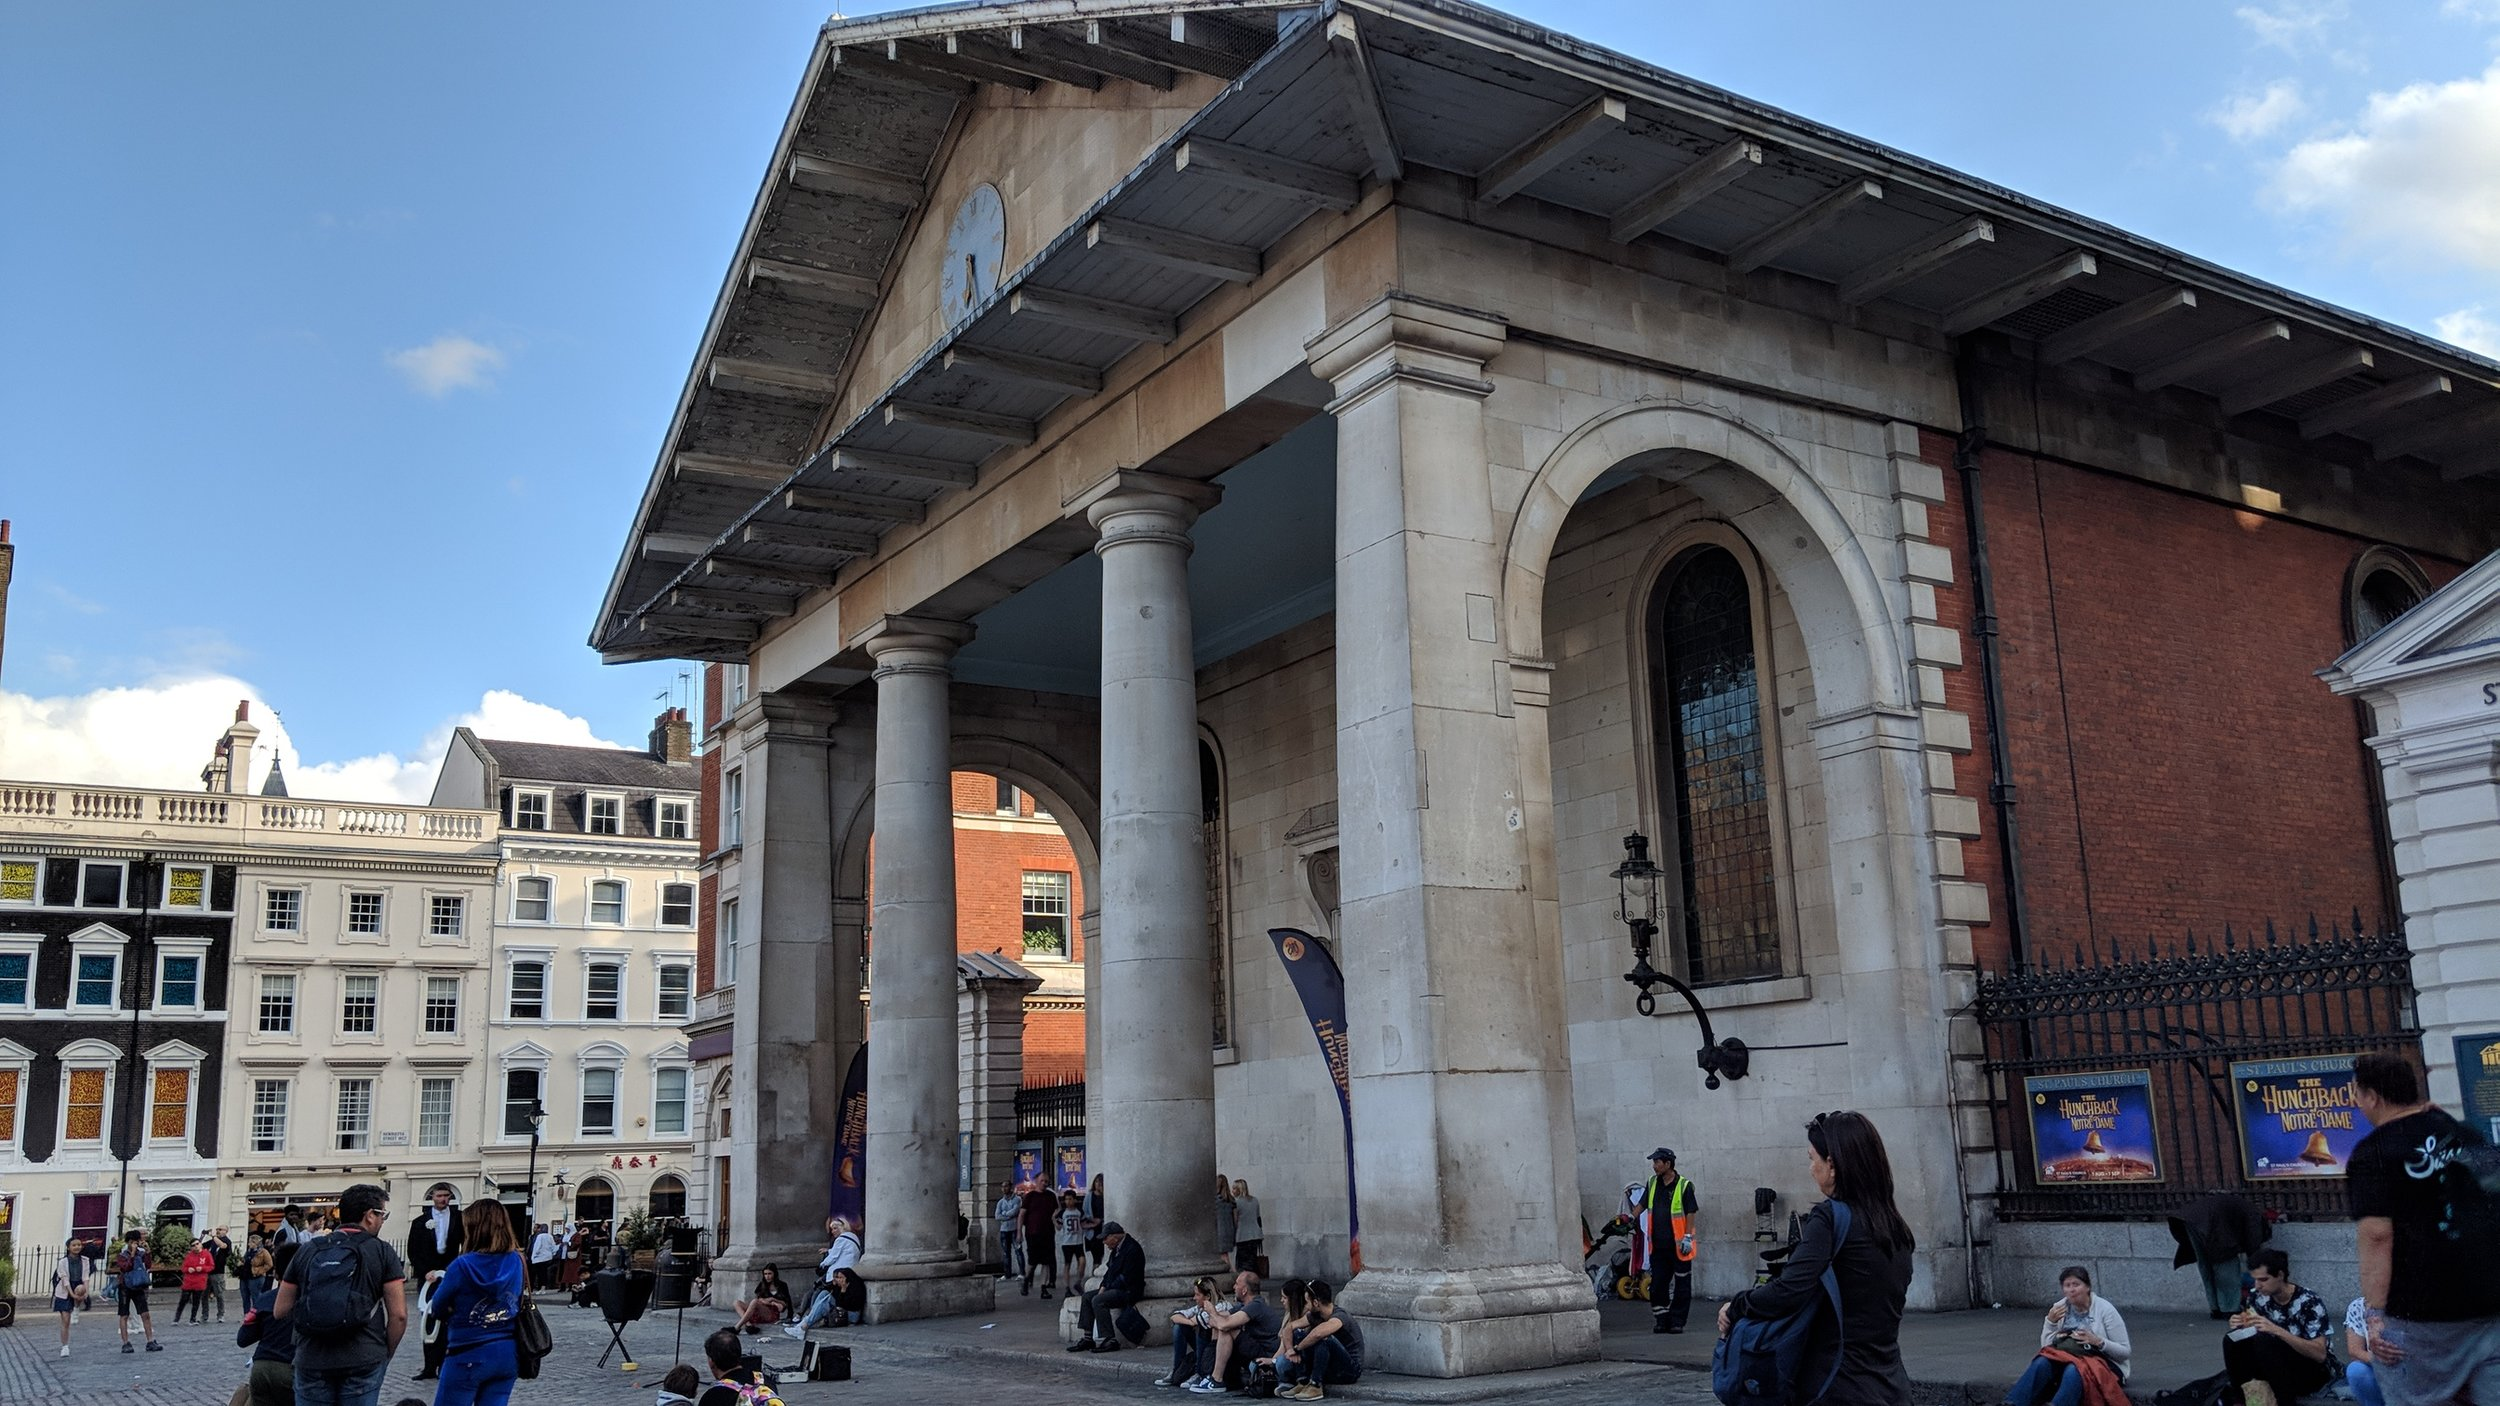 Iris Theatre, St Paul's Church - visited 06/08/2019